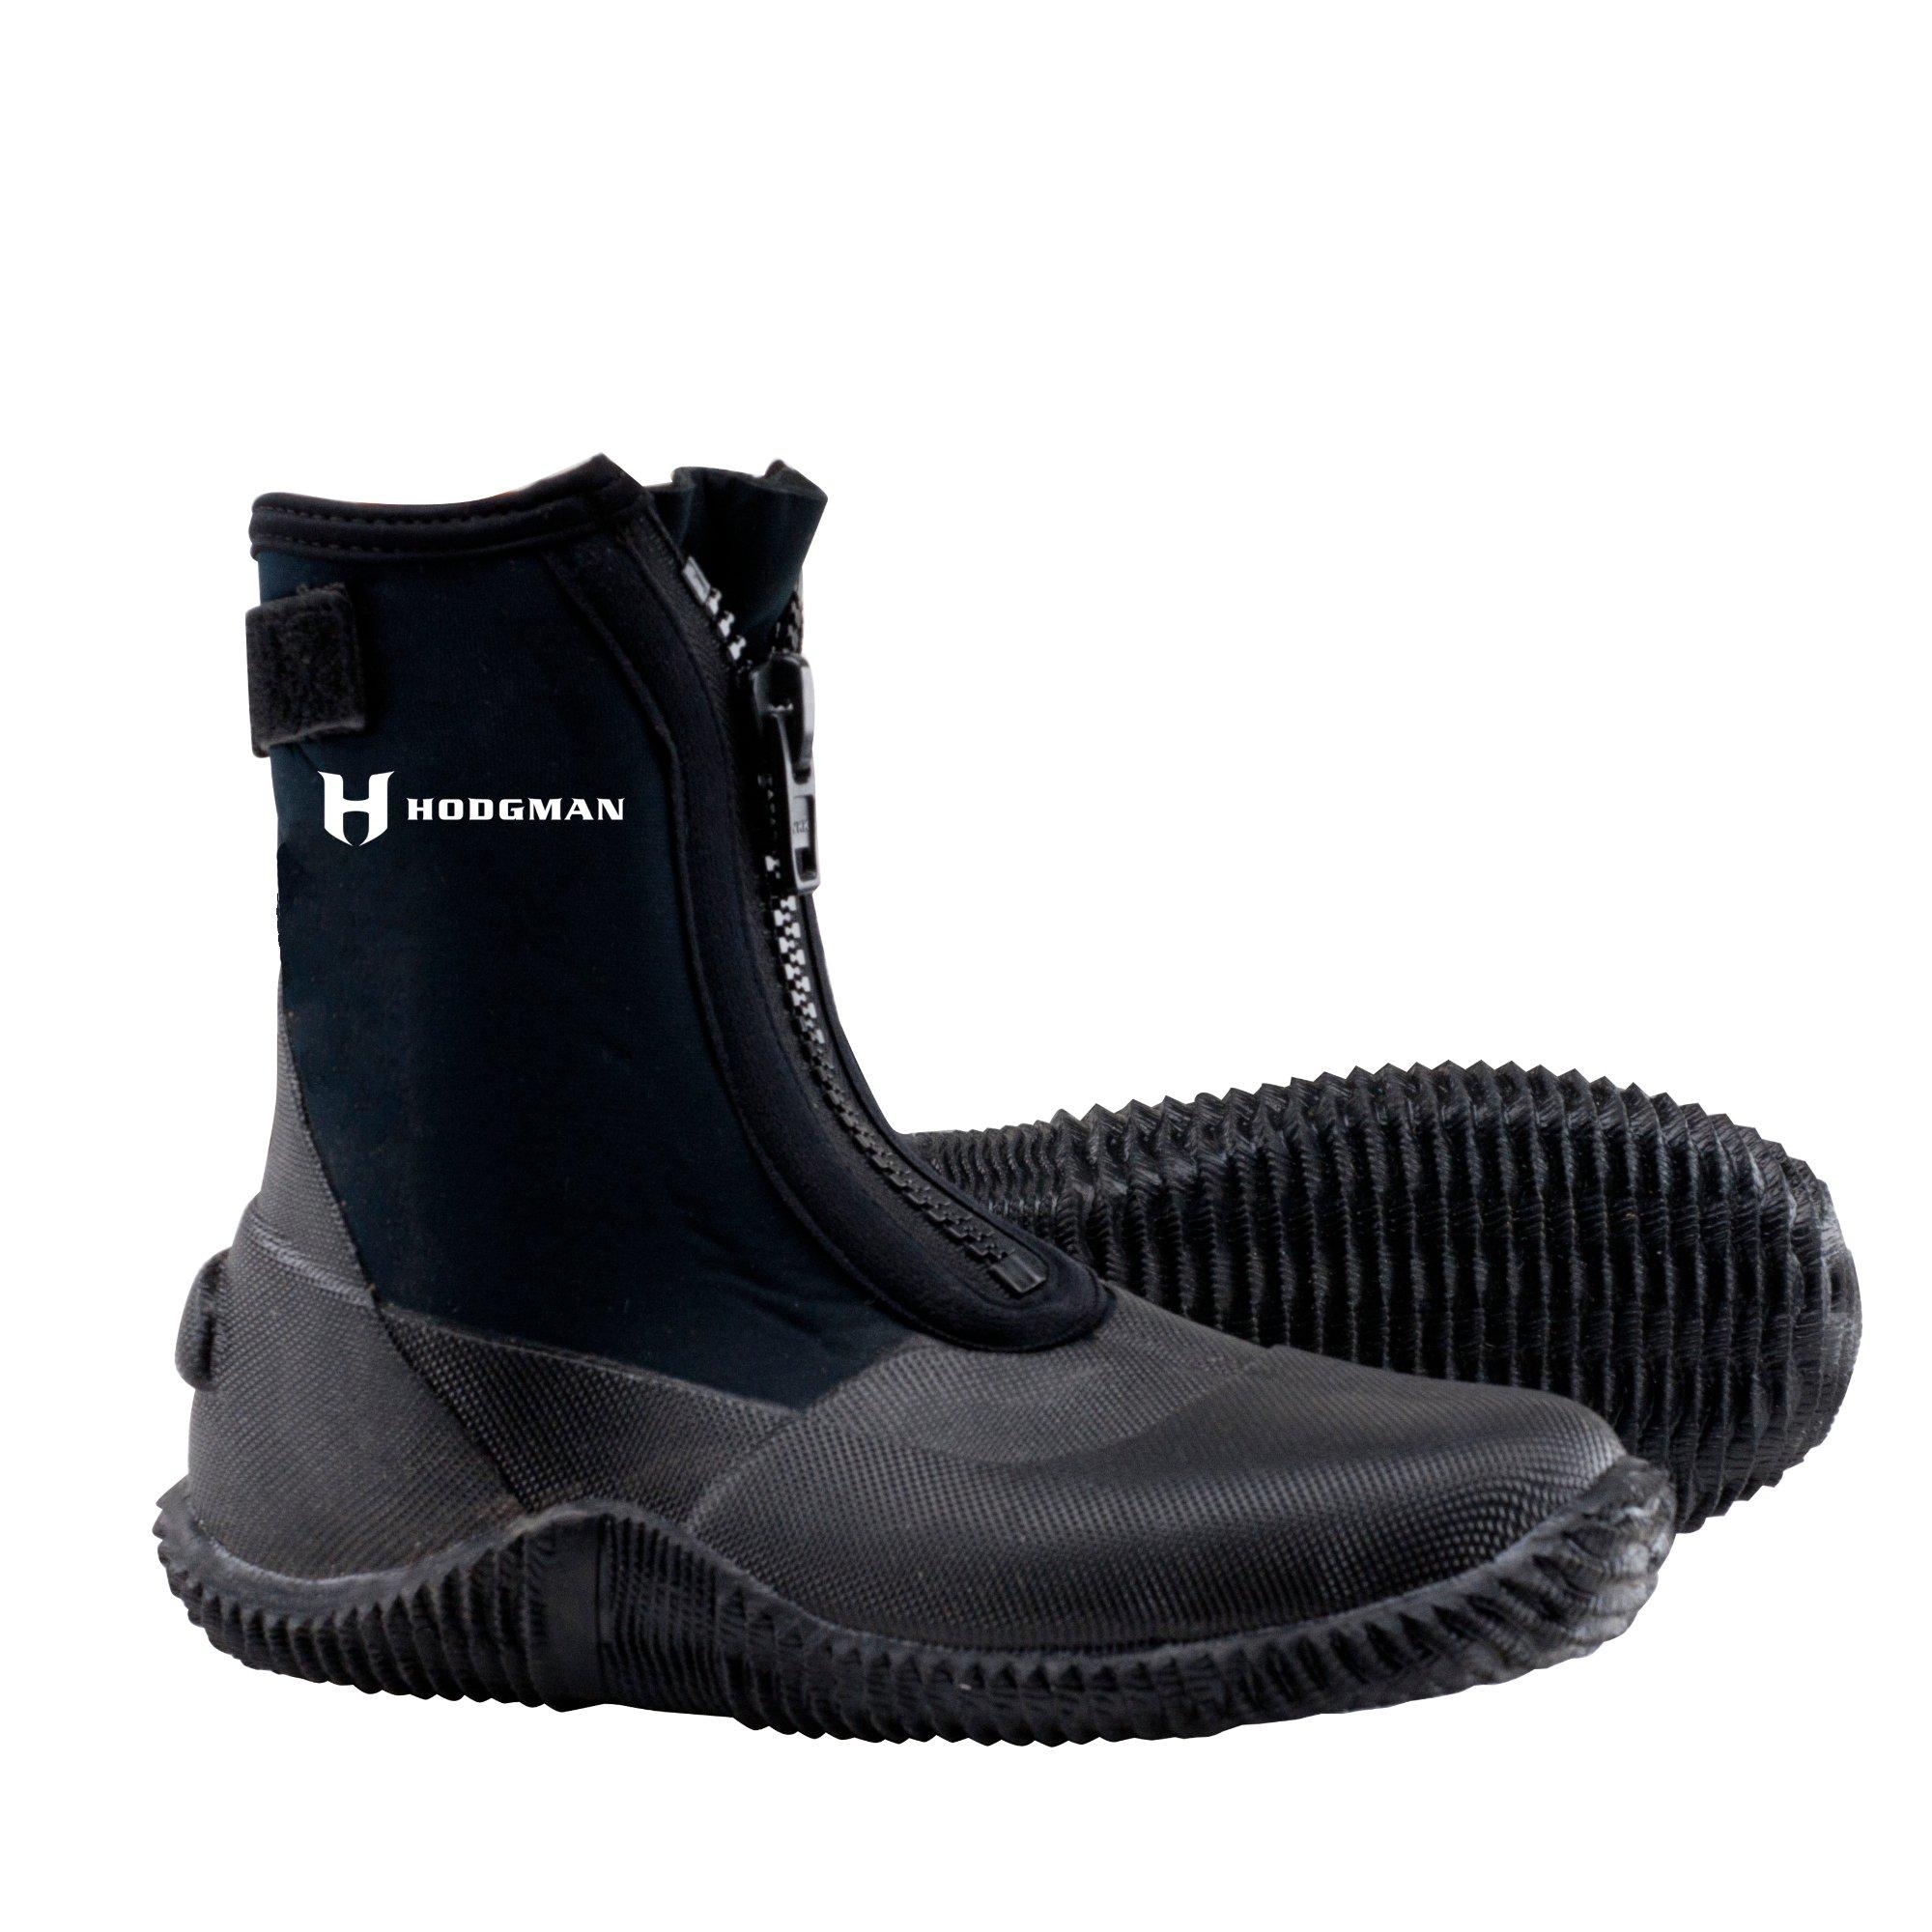 Hodgman Neoprene Wade Shoe, Size 10 by Hodgman